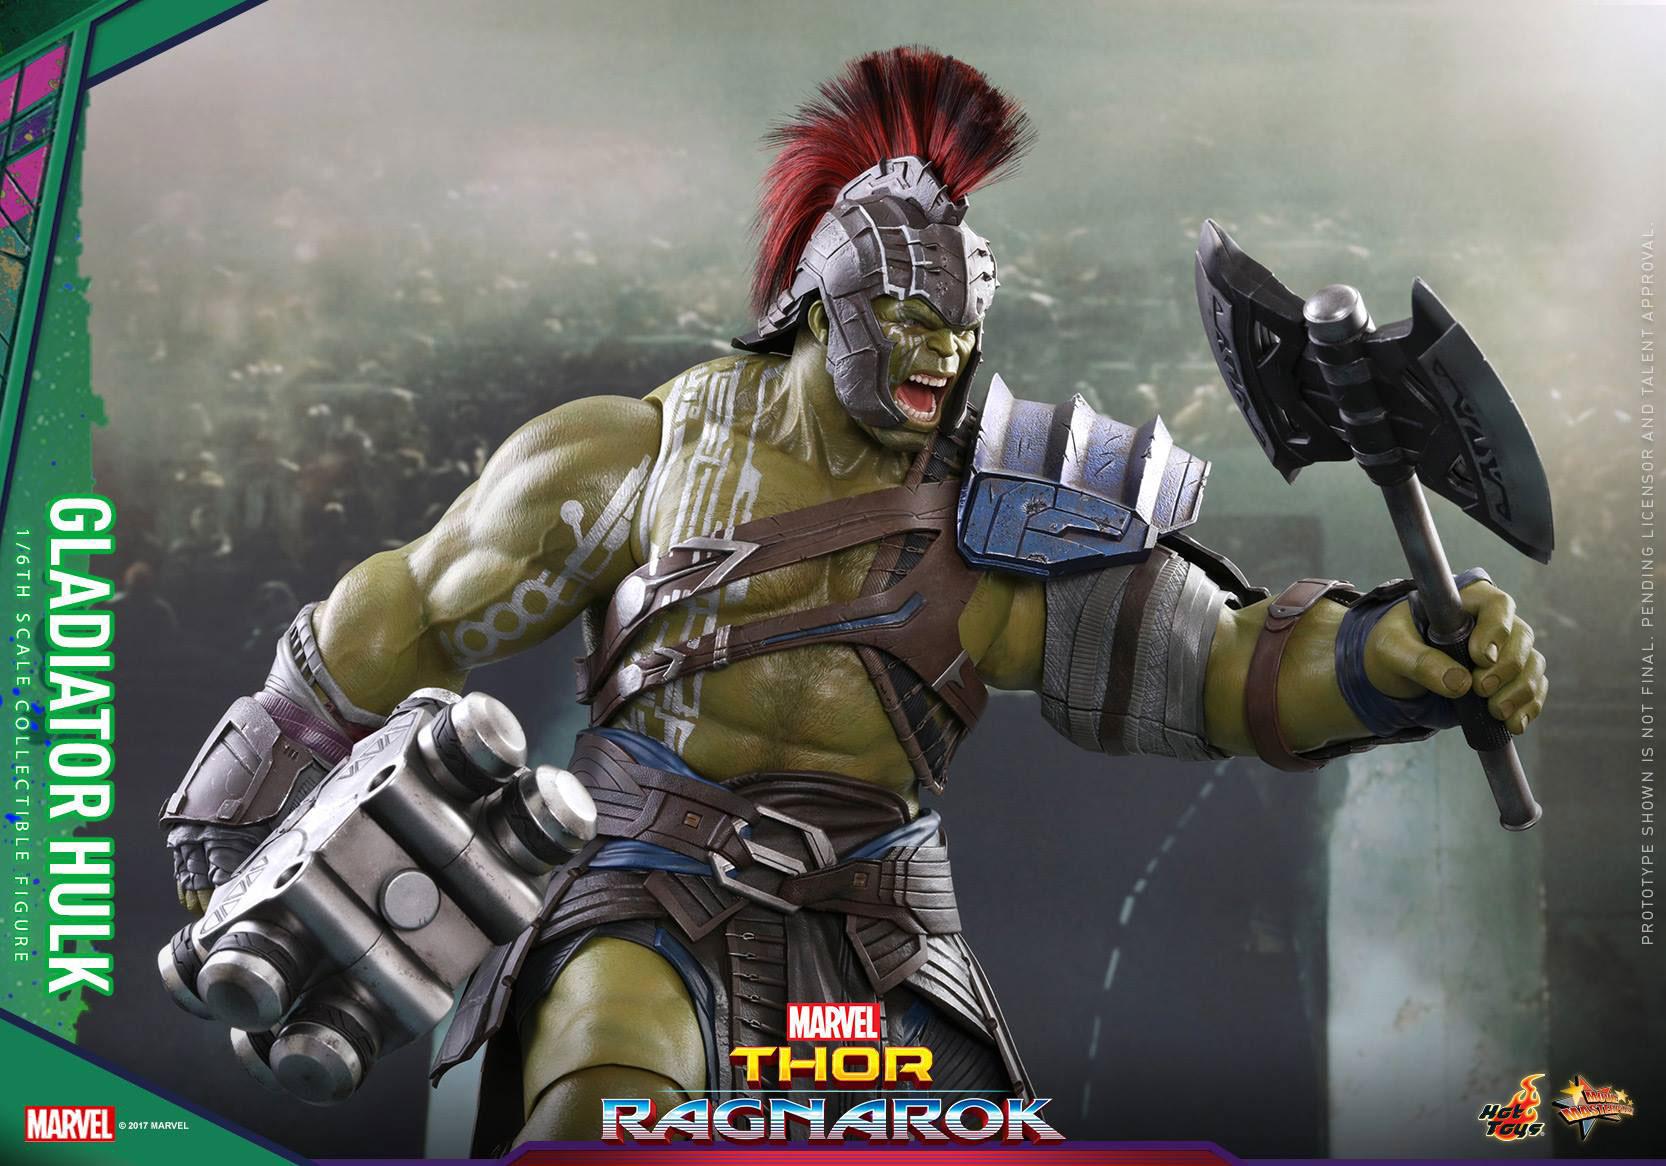 thor-ragnarok-gladiator-hulk-hot-toys-figure-2